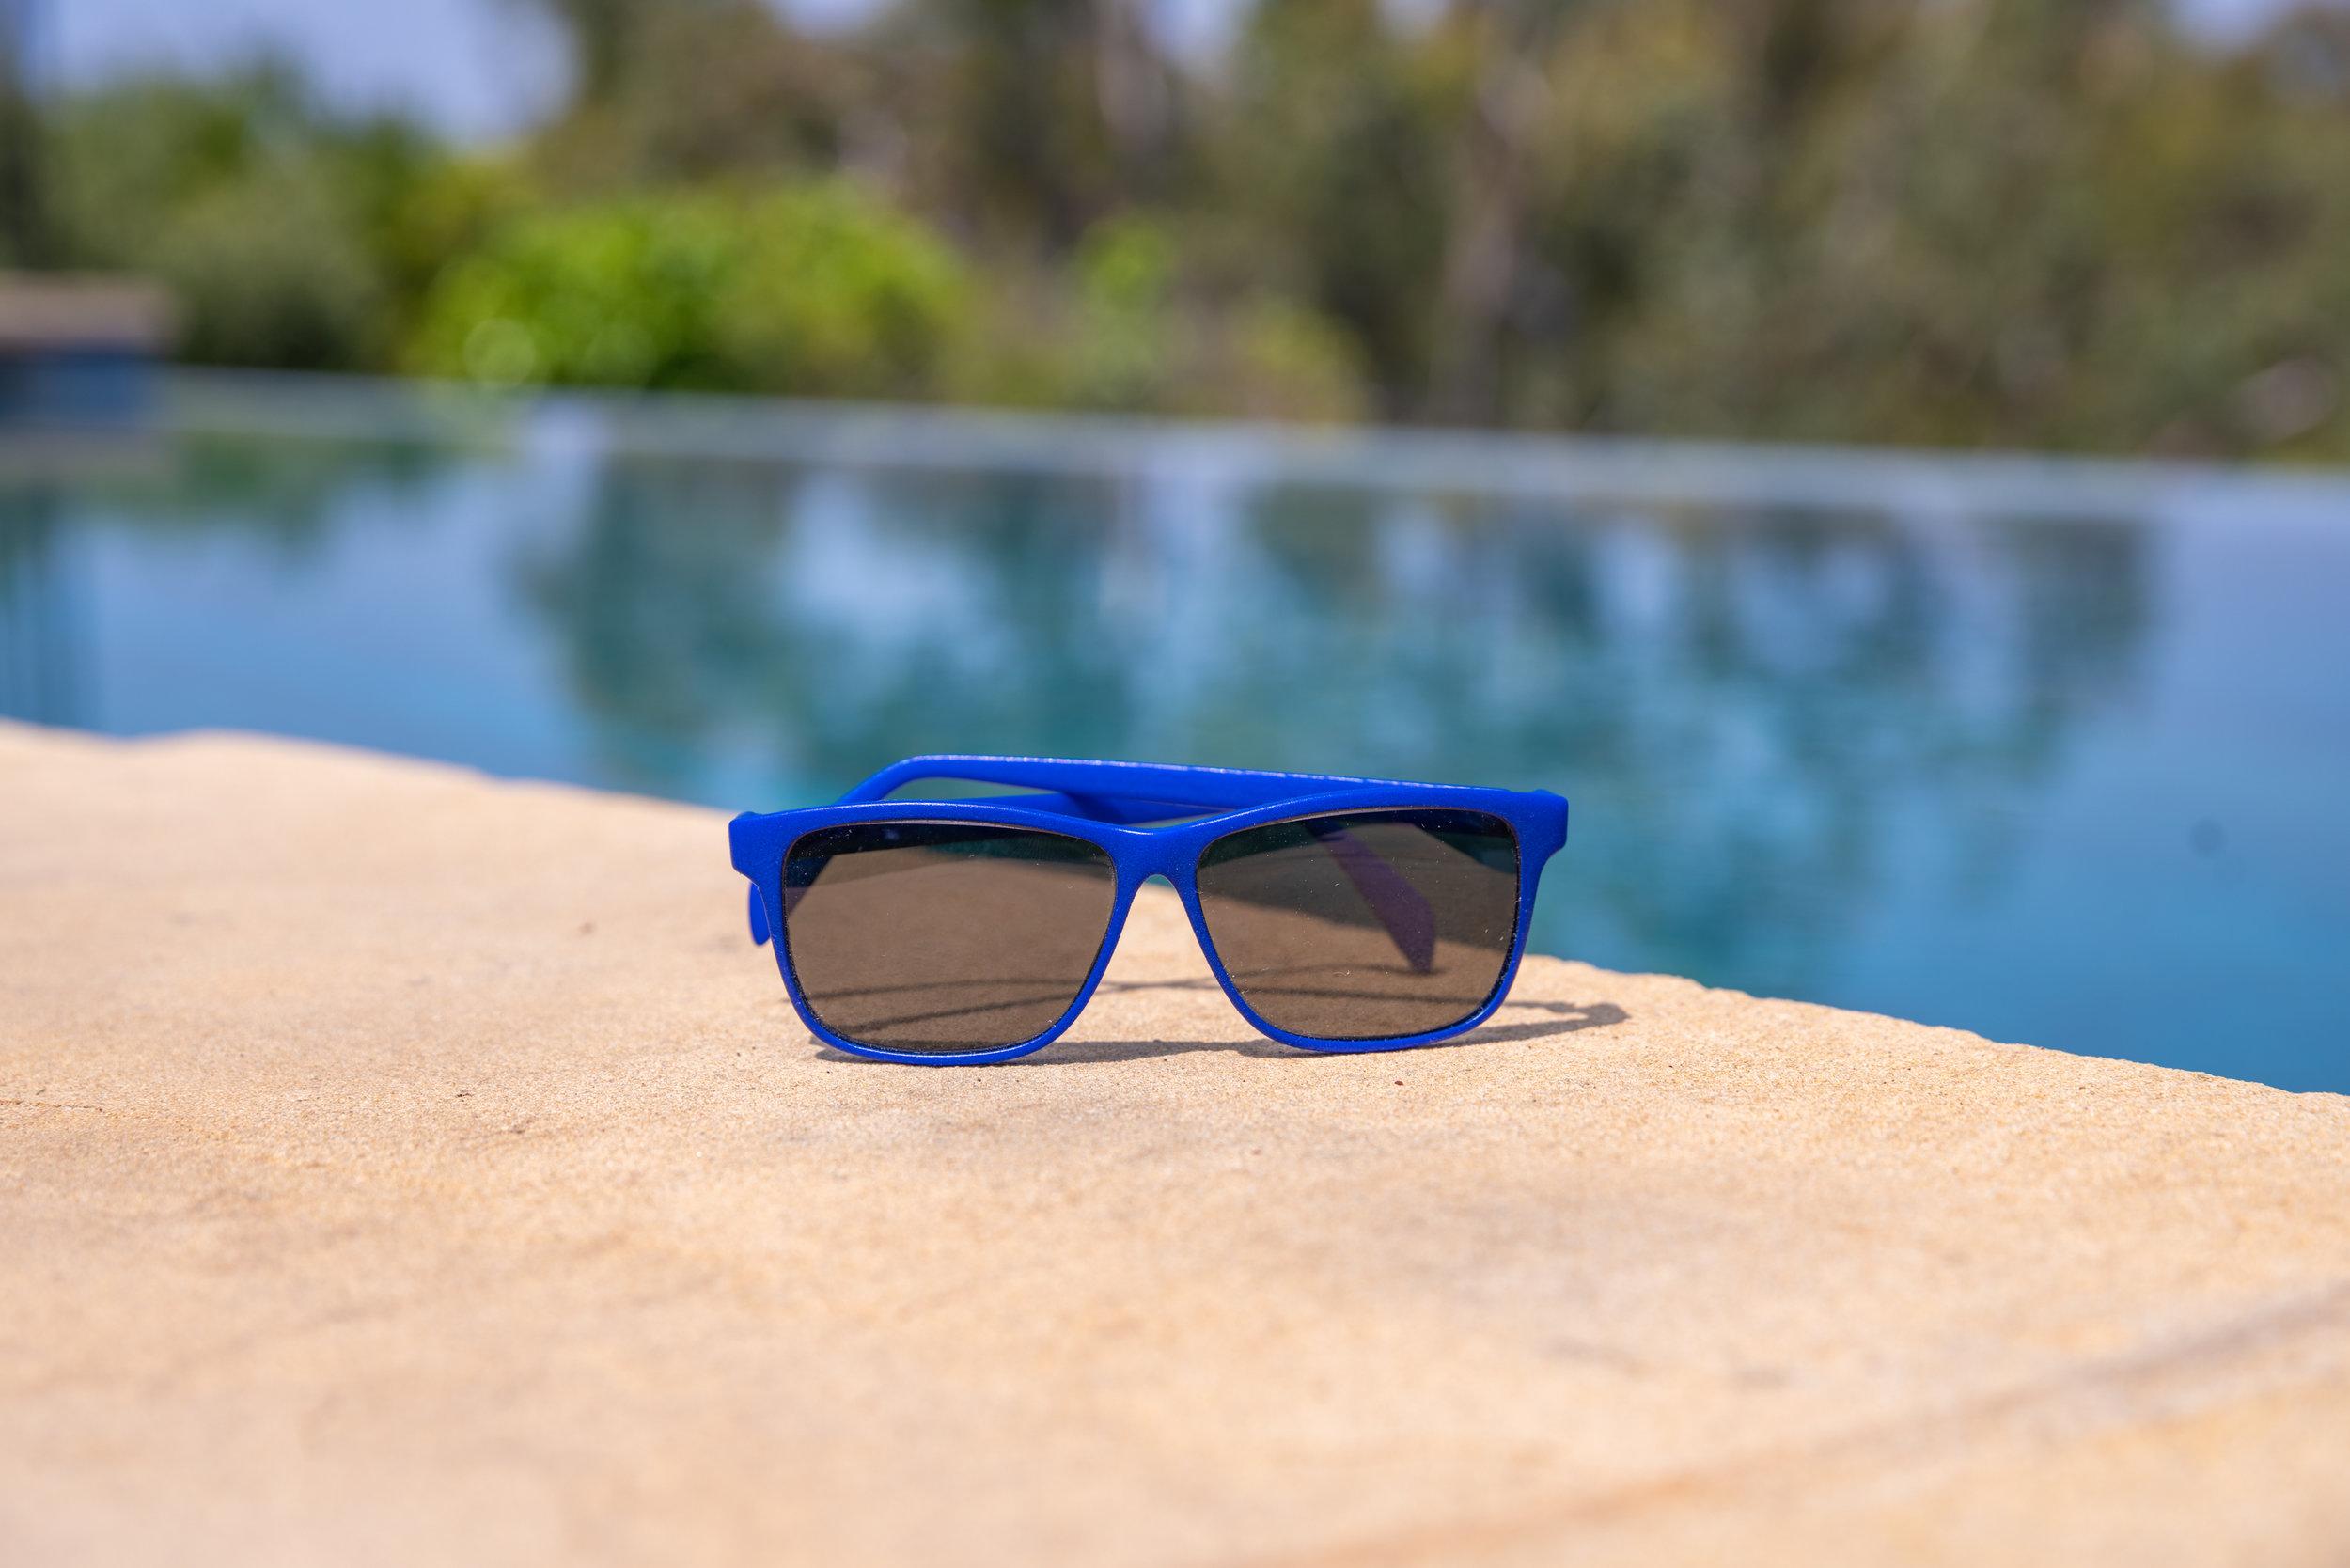 Fitz_Sunglasses.JPG